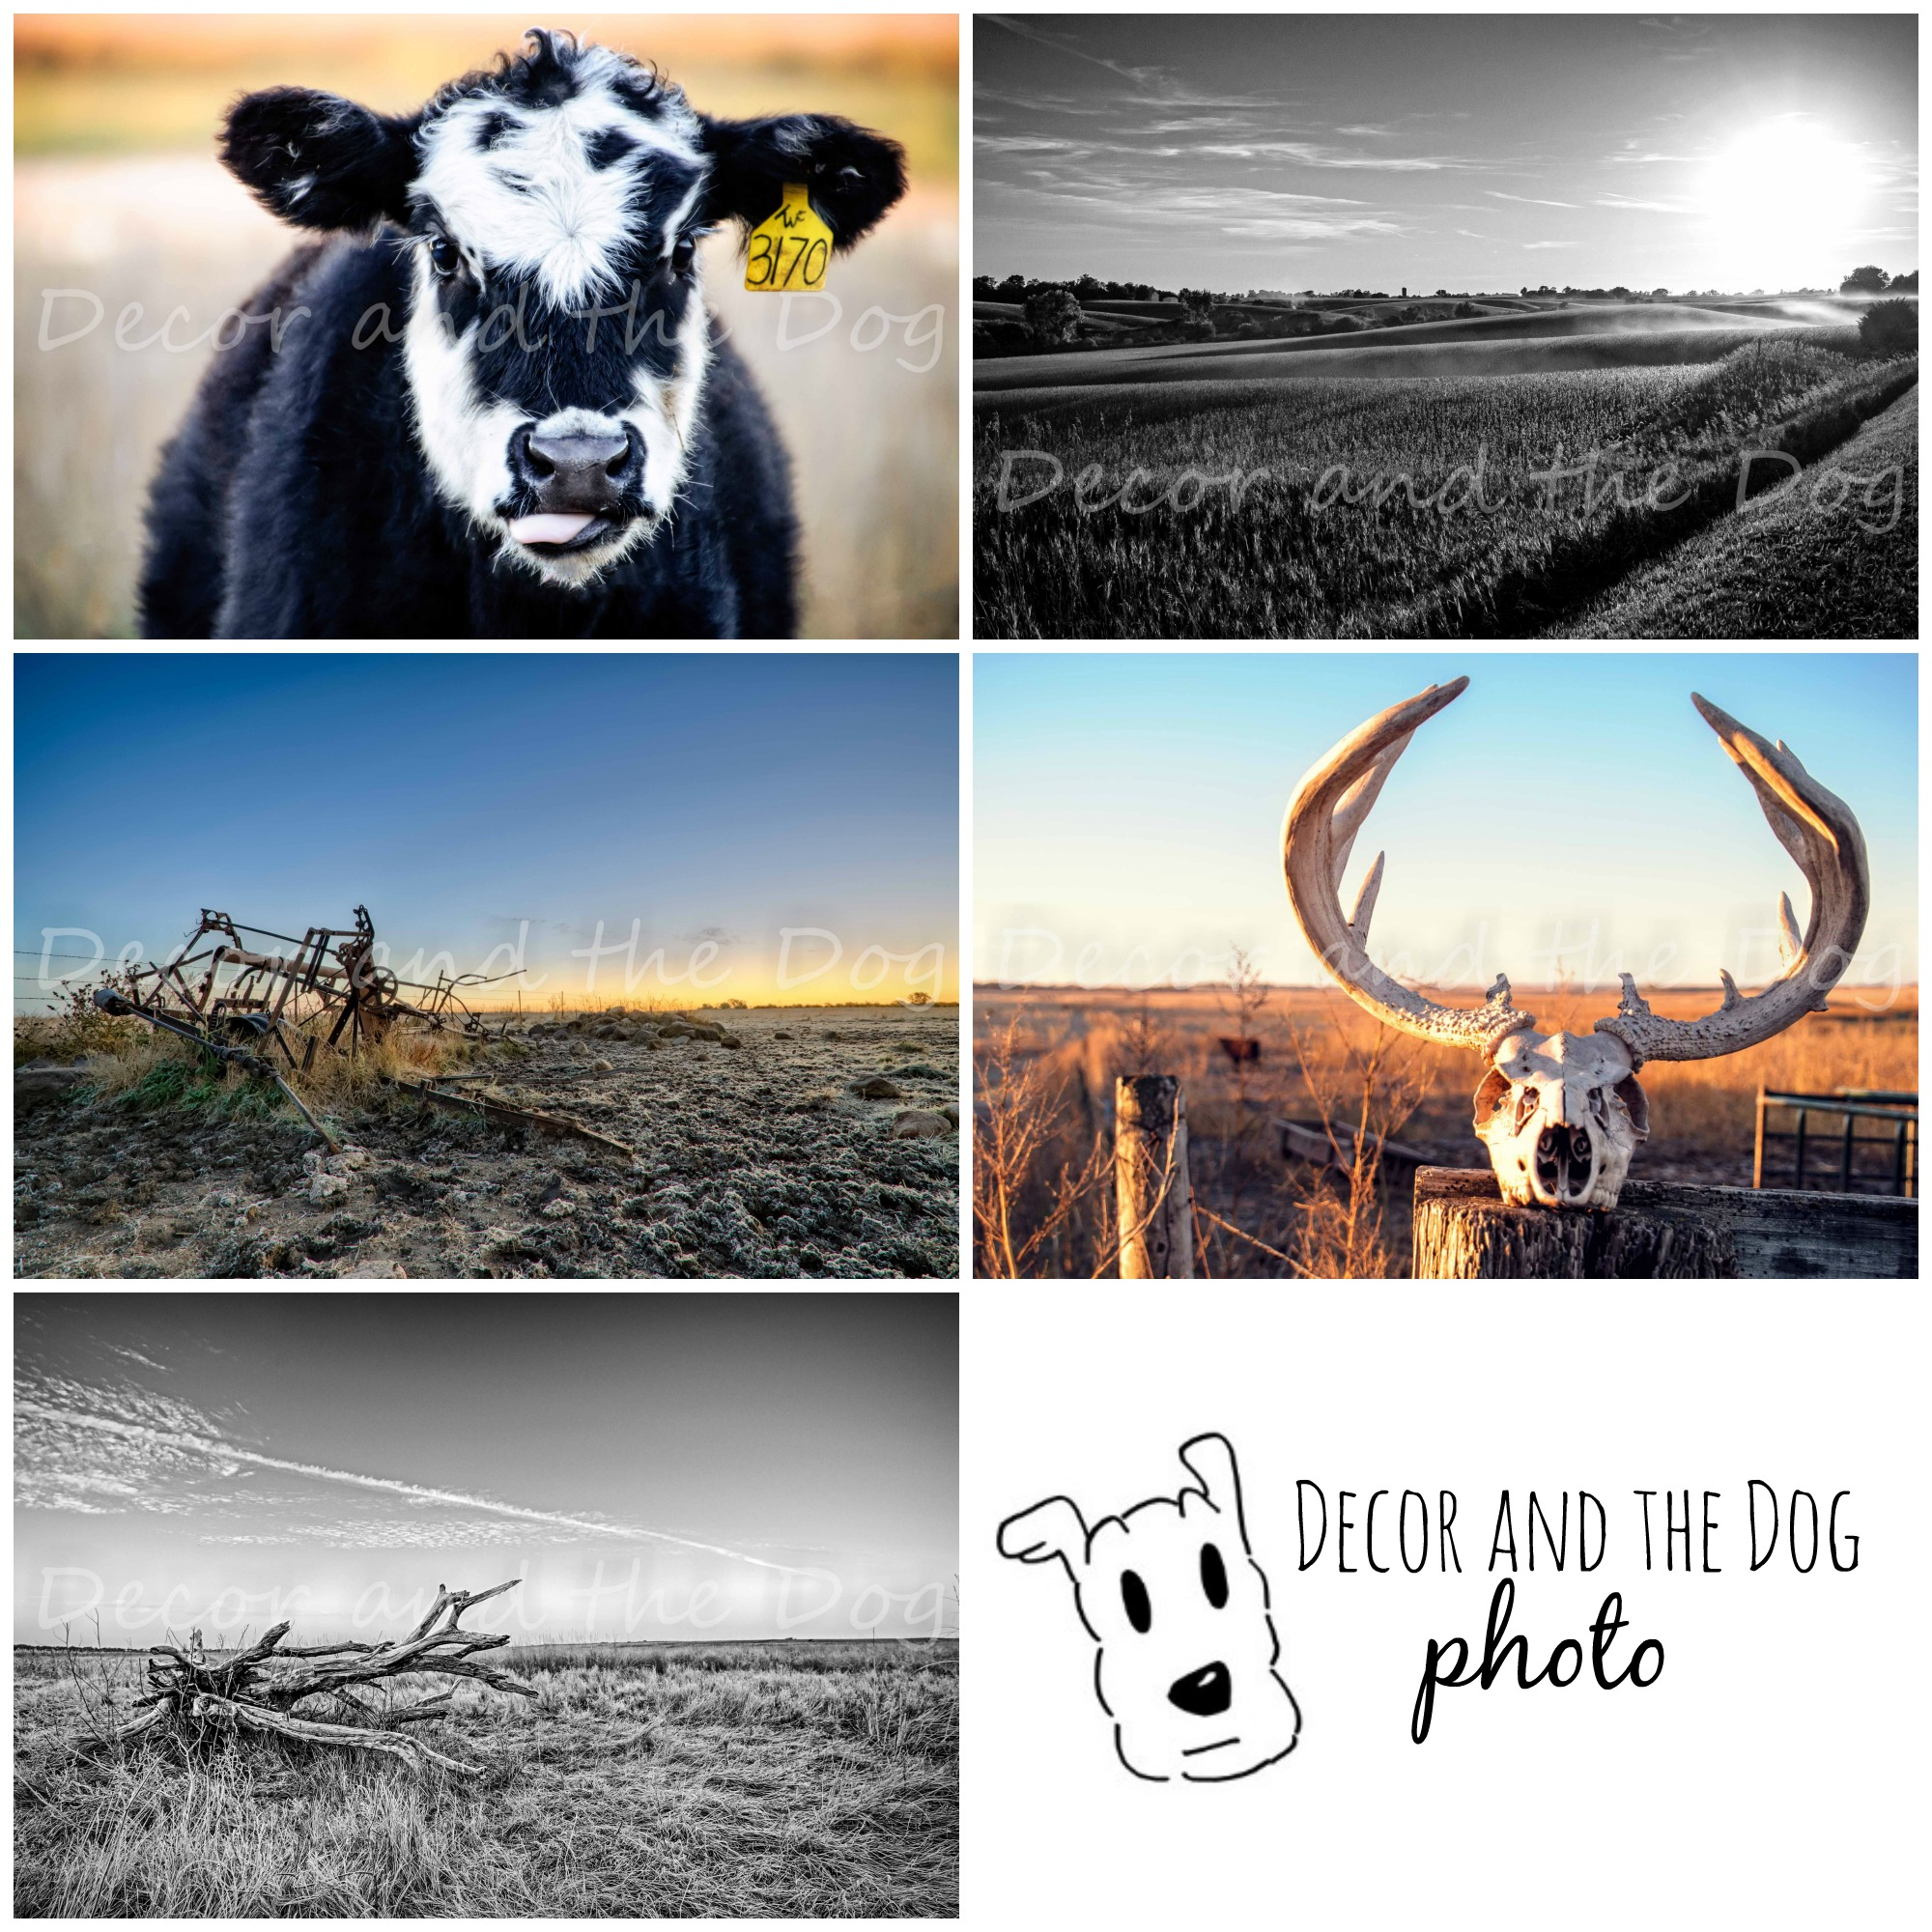 Decor and the Dog Photo 2014